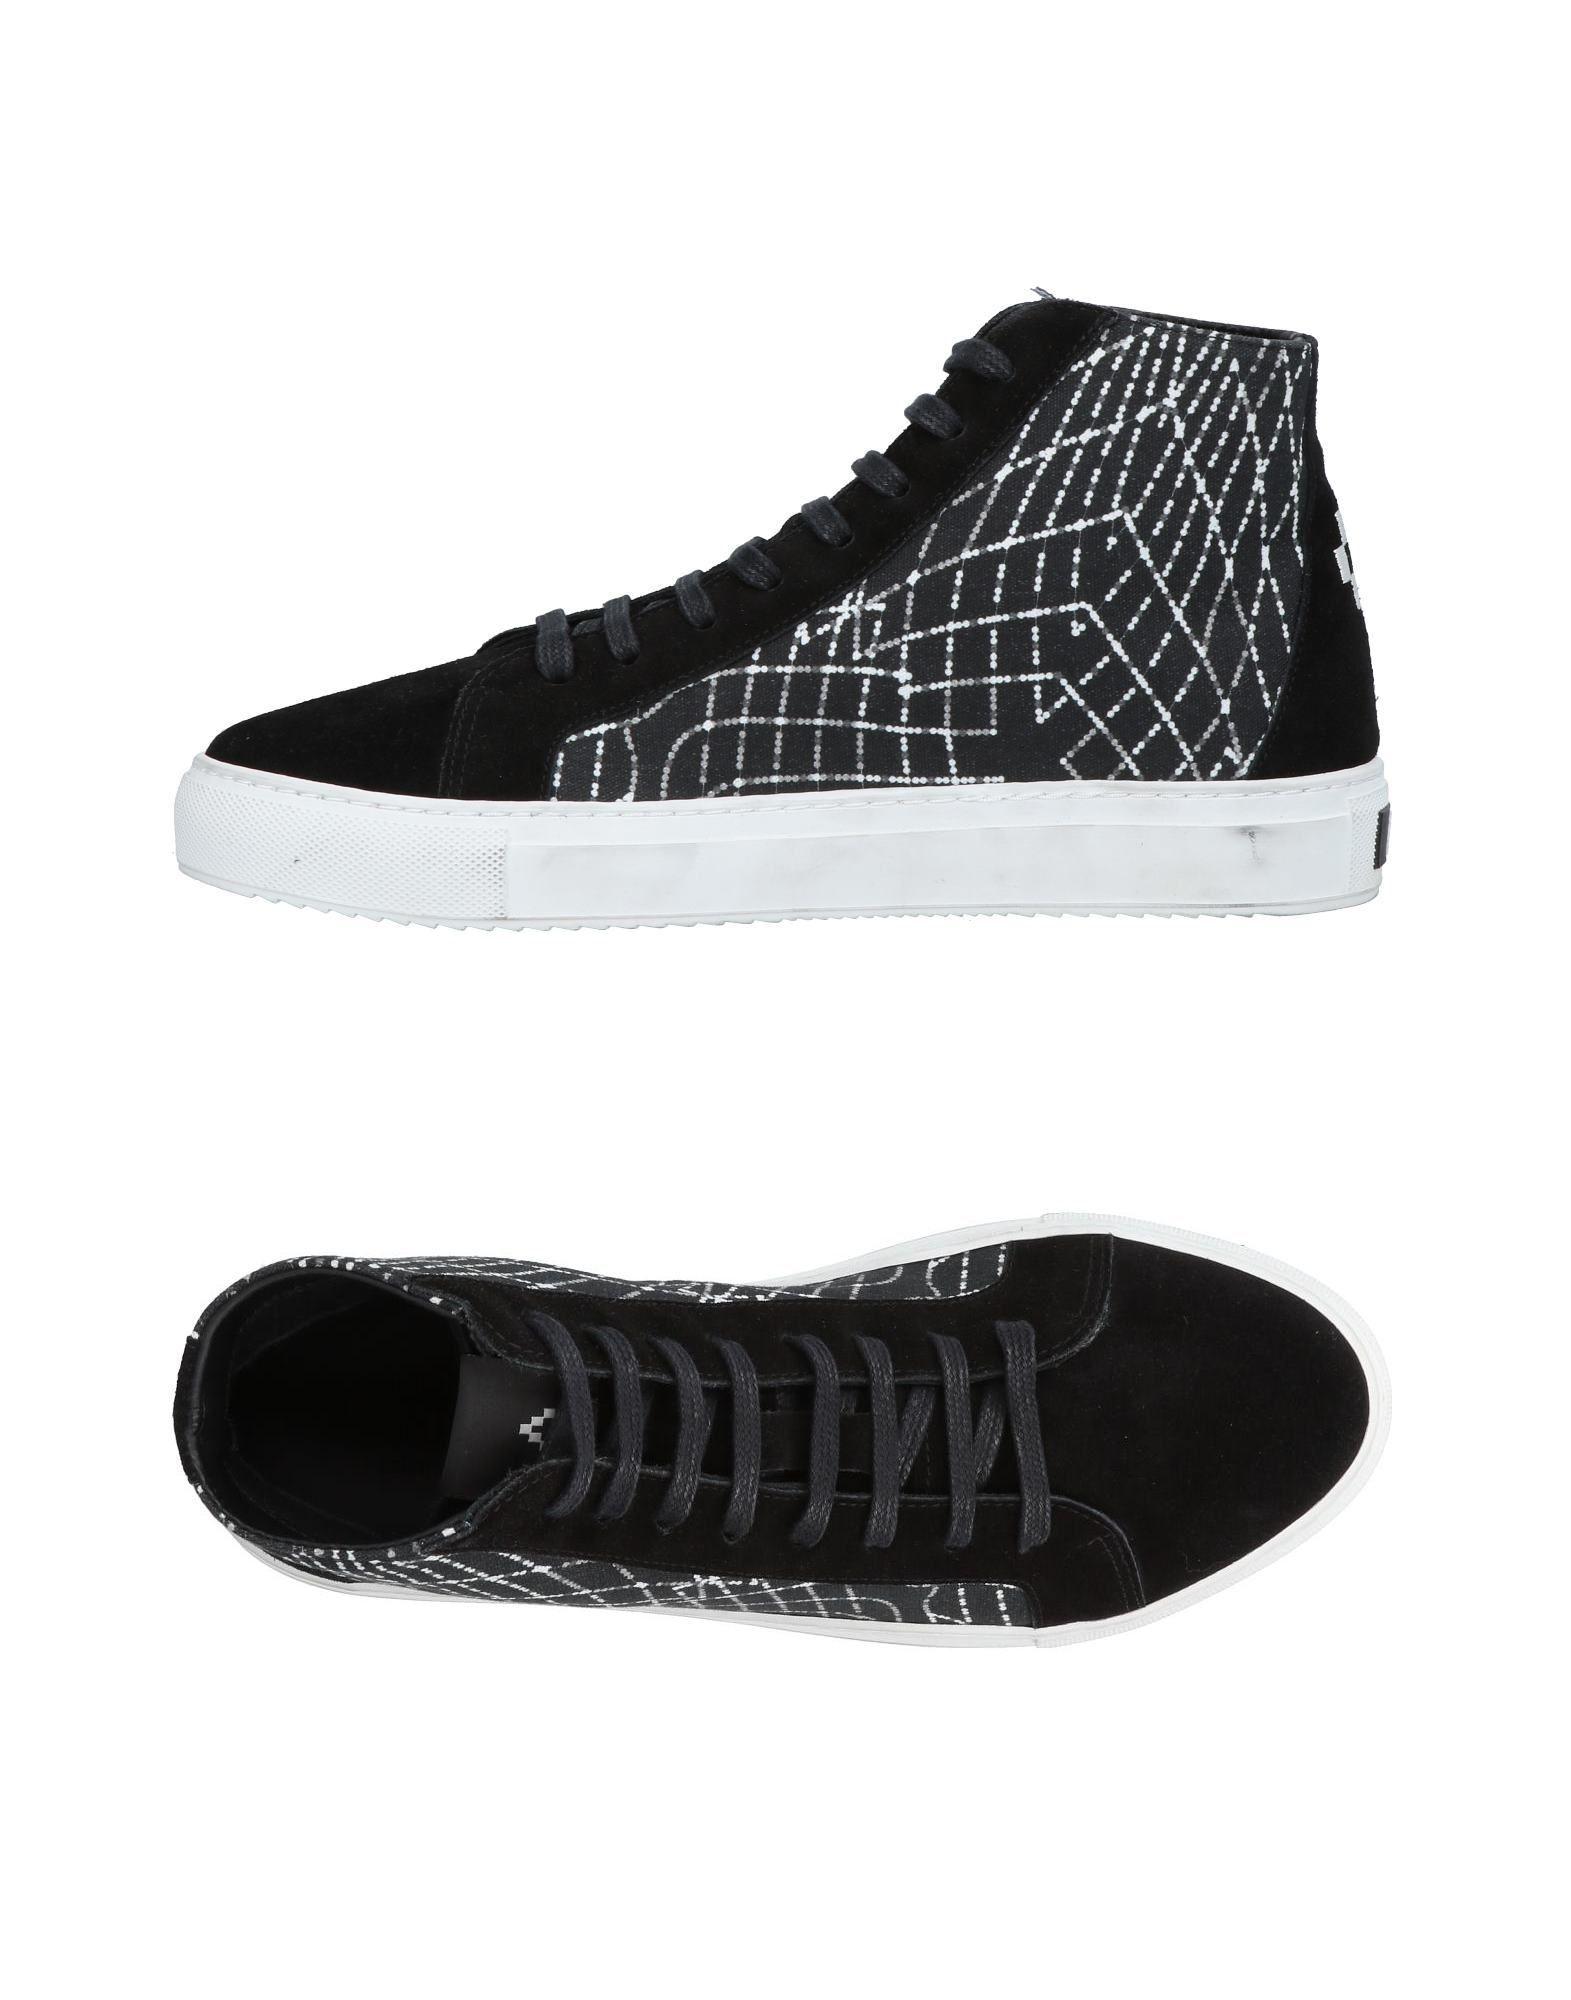 Marcelo Burlon Sneakers Herren  11451318EI Gute Qualität beliebte Schuhe